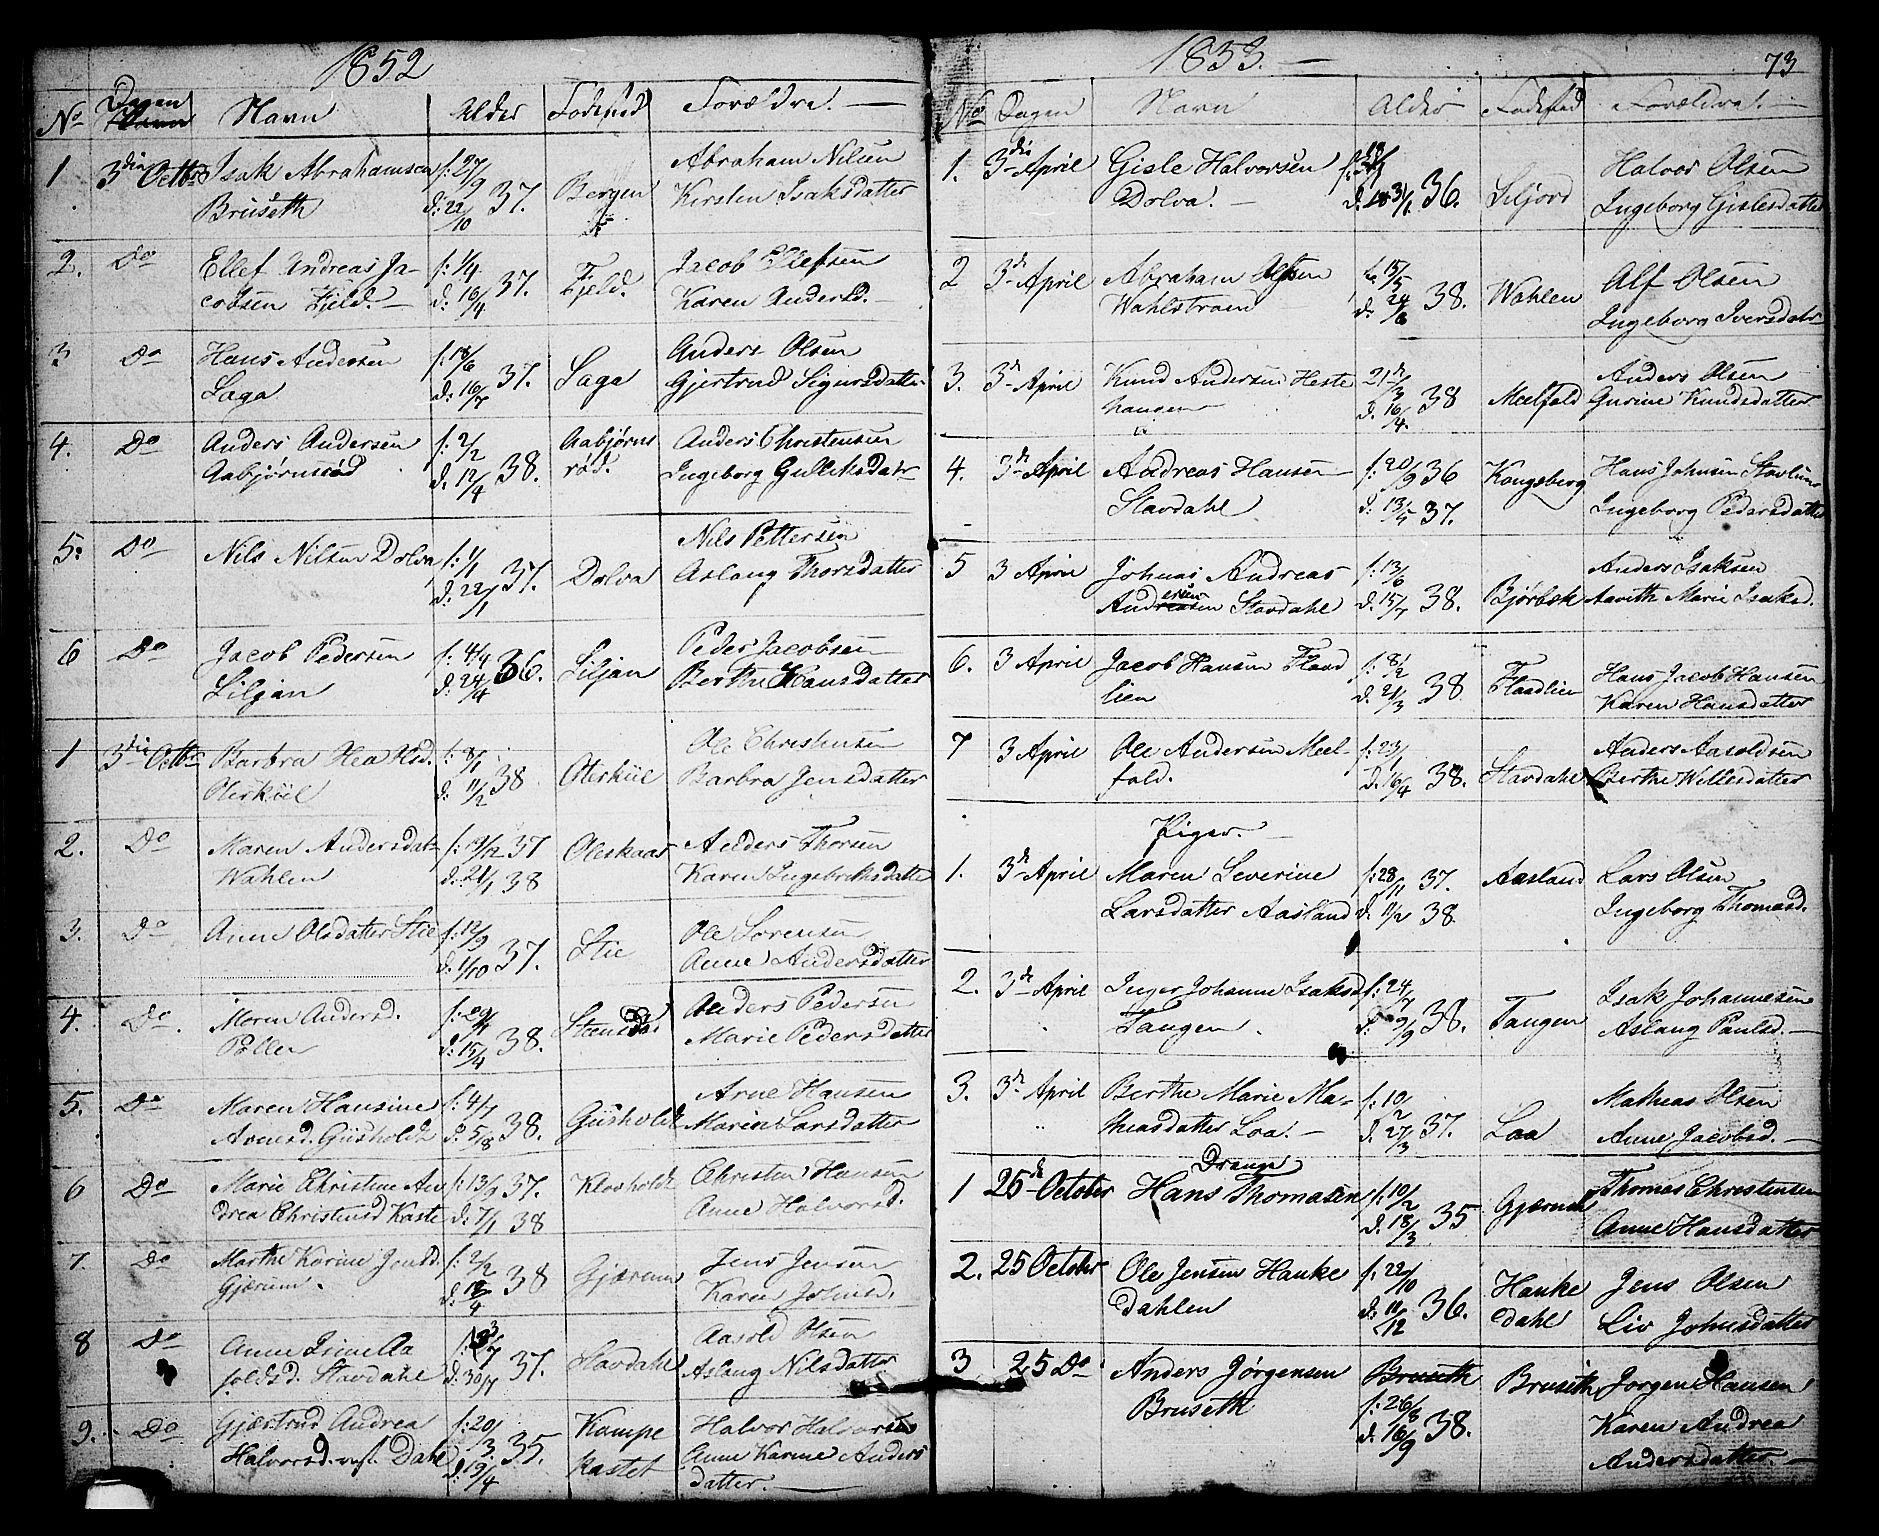 SAKO, Solum kirkebøker, G/Gb/L0001: Klokkerbok nr. II 1, 1848-1859, s. 73